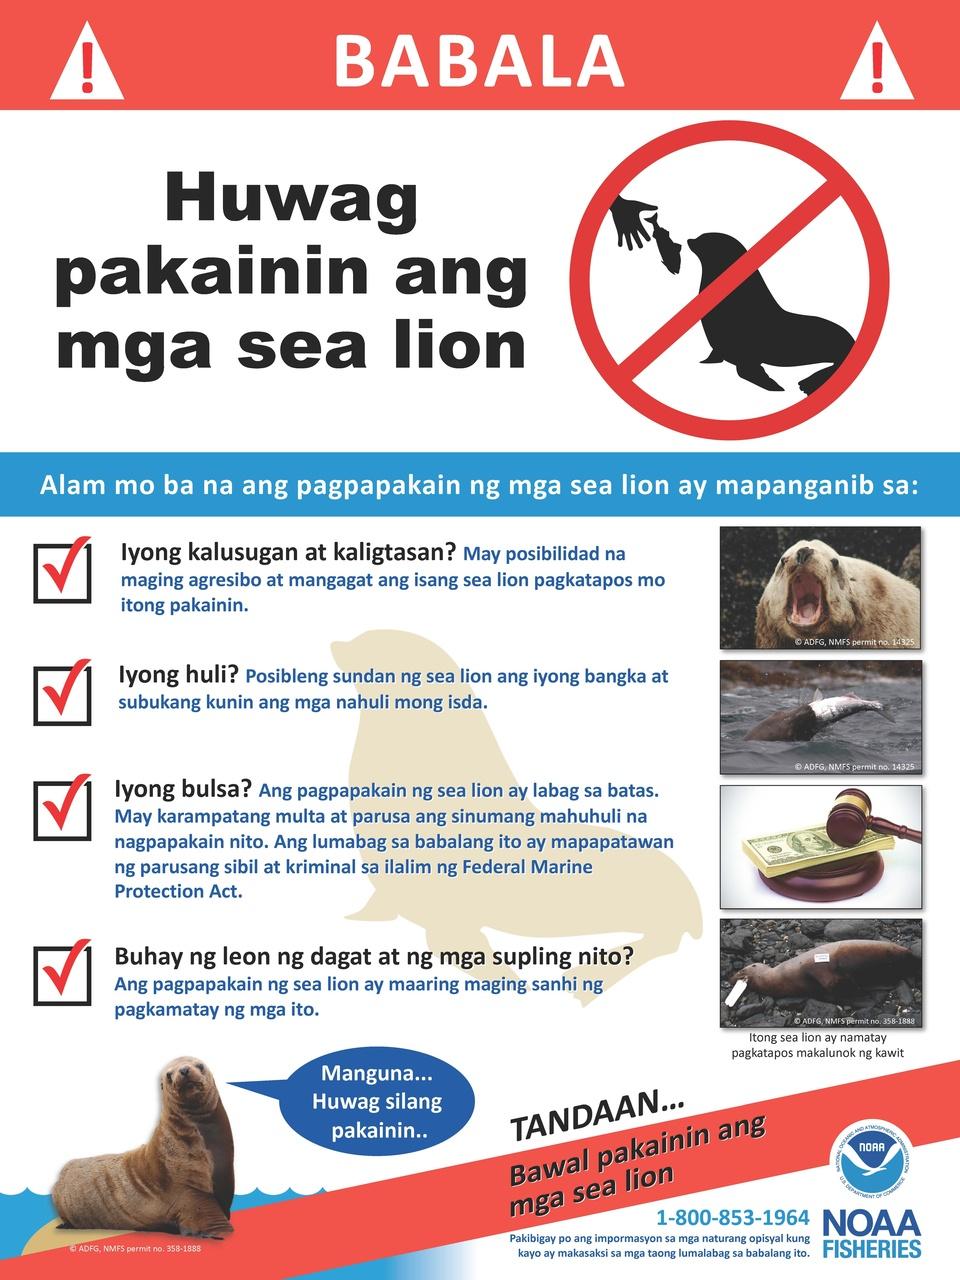 steller-sea-lions-do-not-feed-tagalog-sign.jpg